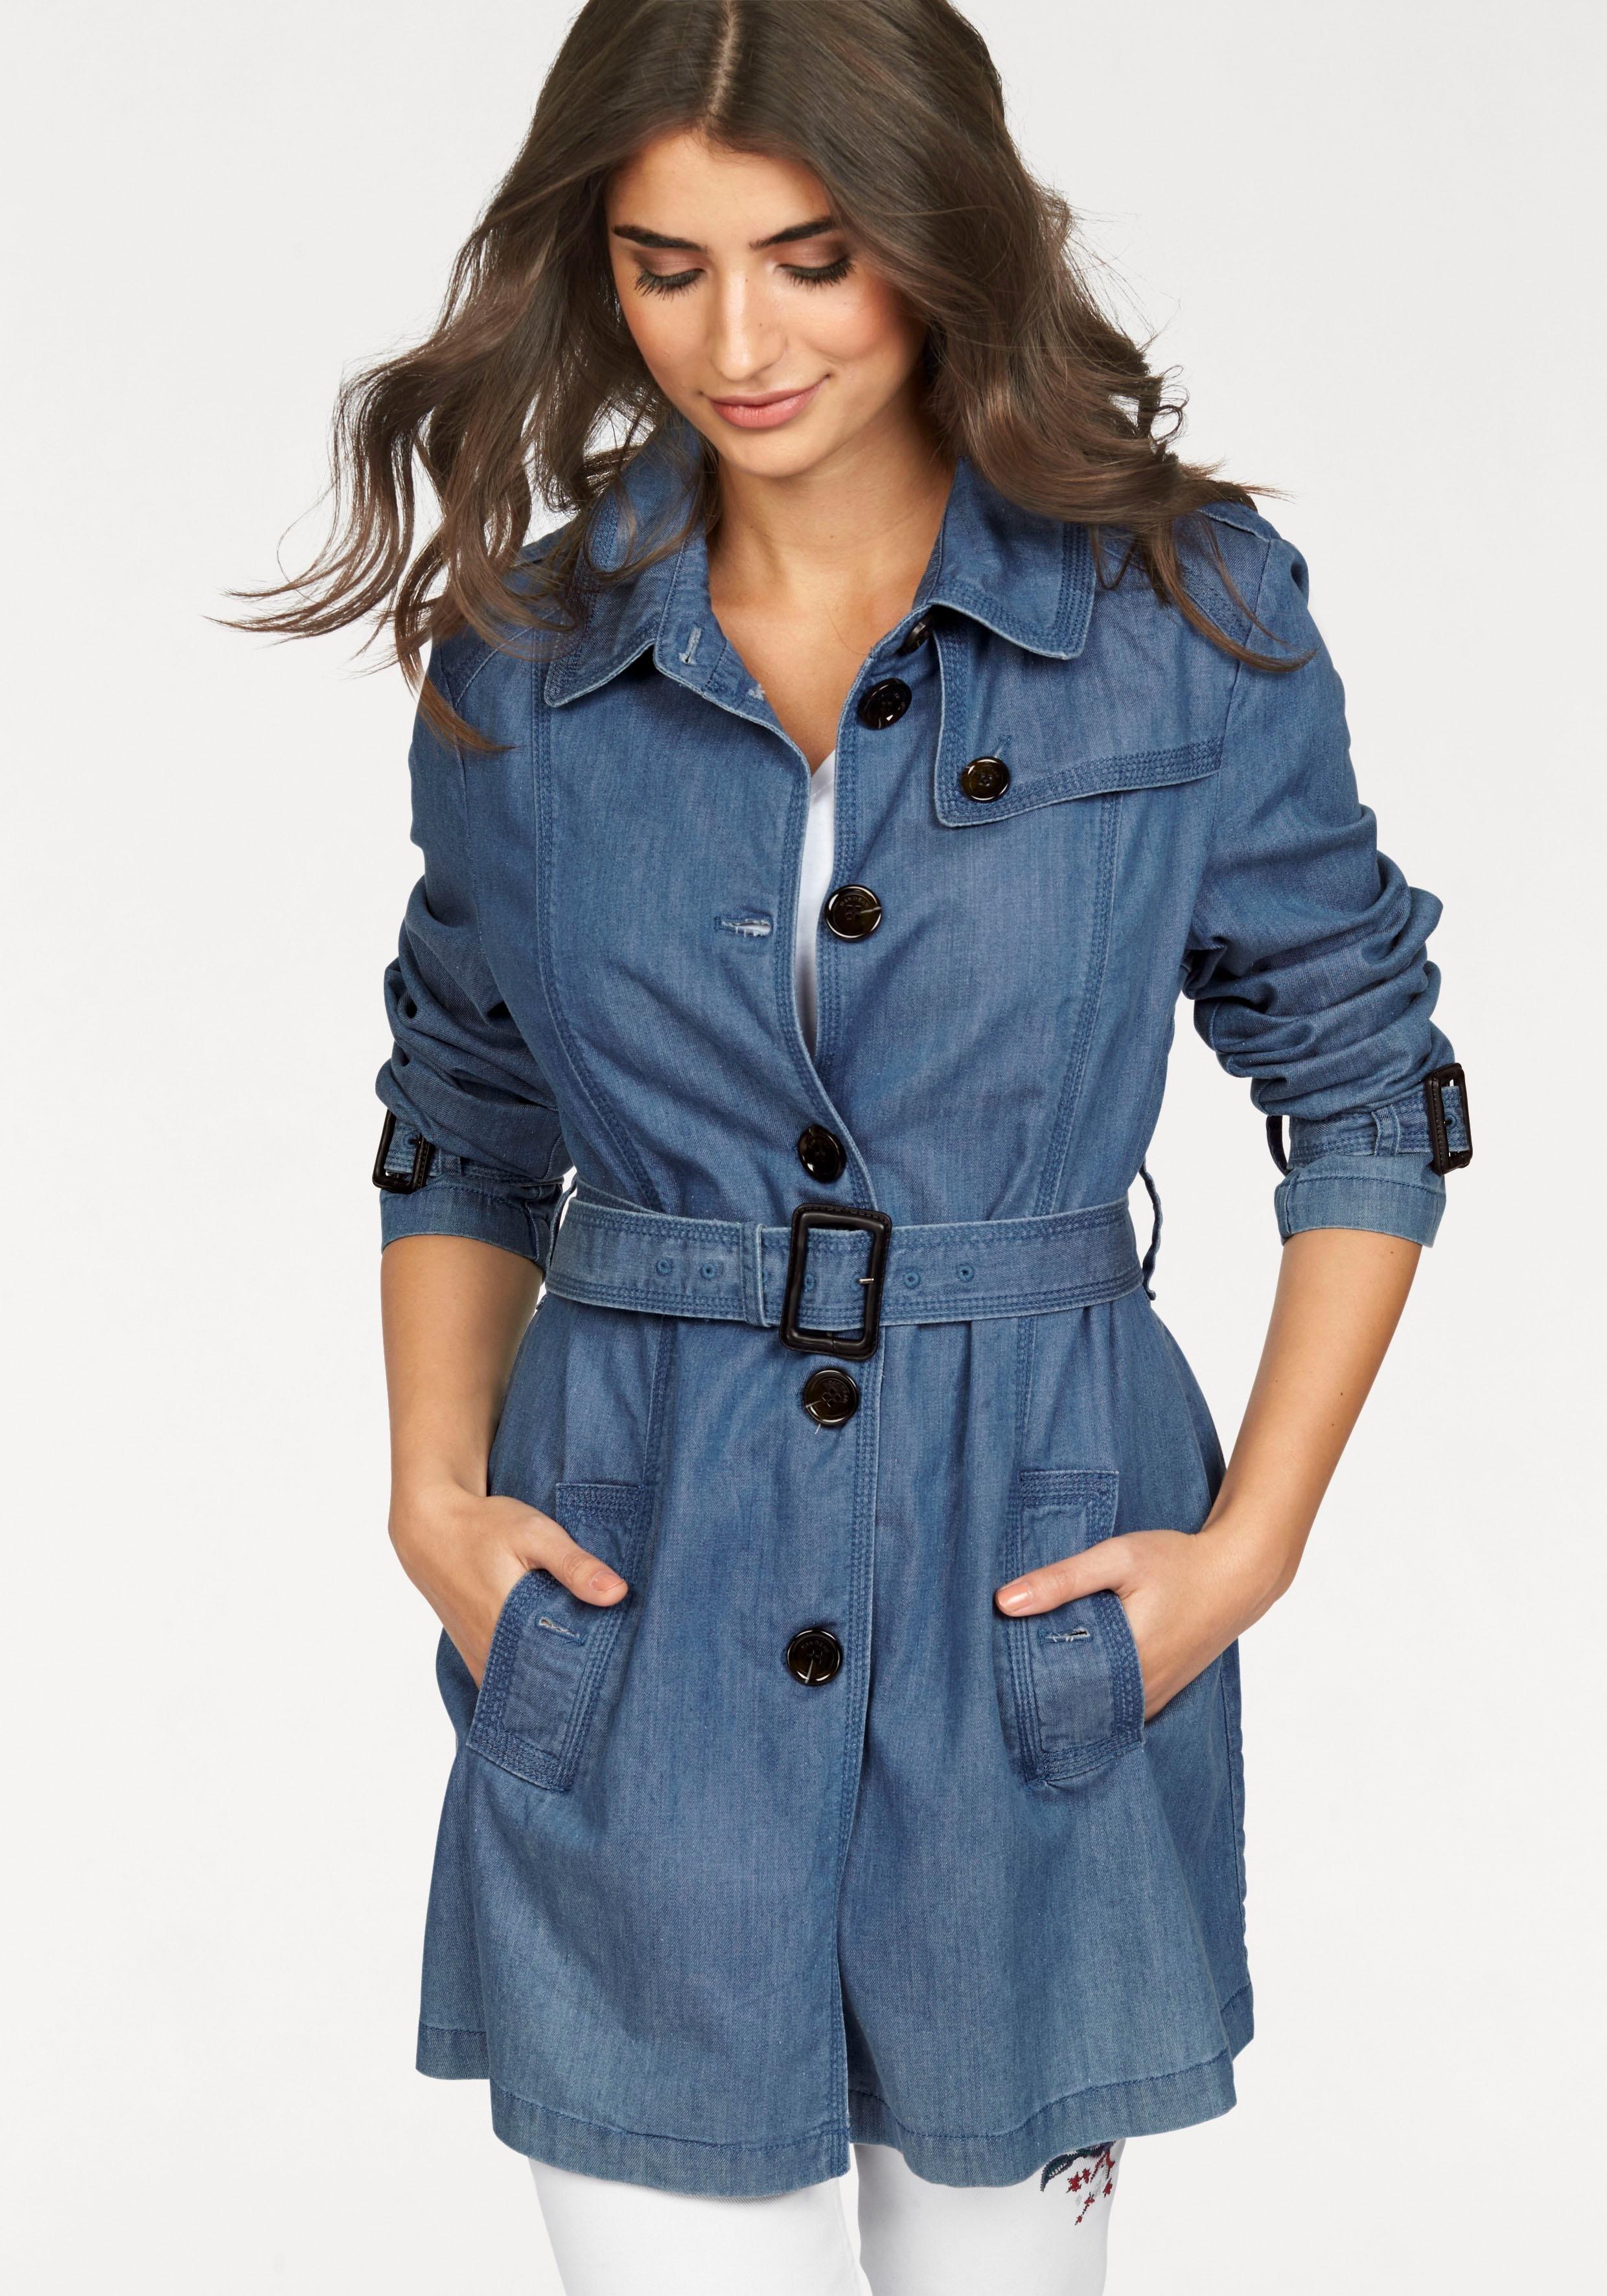 Danwear Trenchcoat (Set, 2 tlg., mit abnehmbarem Gürtel), Mantel aus Jeansware | Bekleidung > Mäntel > Trenchcoats | Denim | Danwear